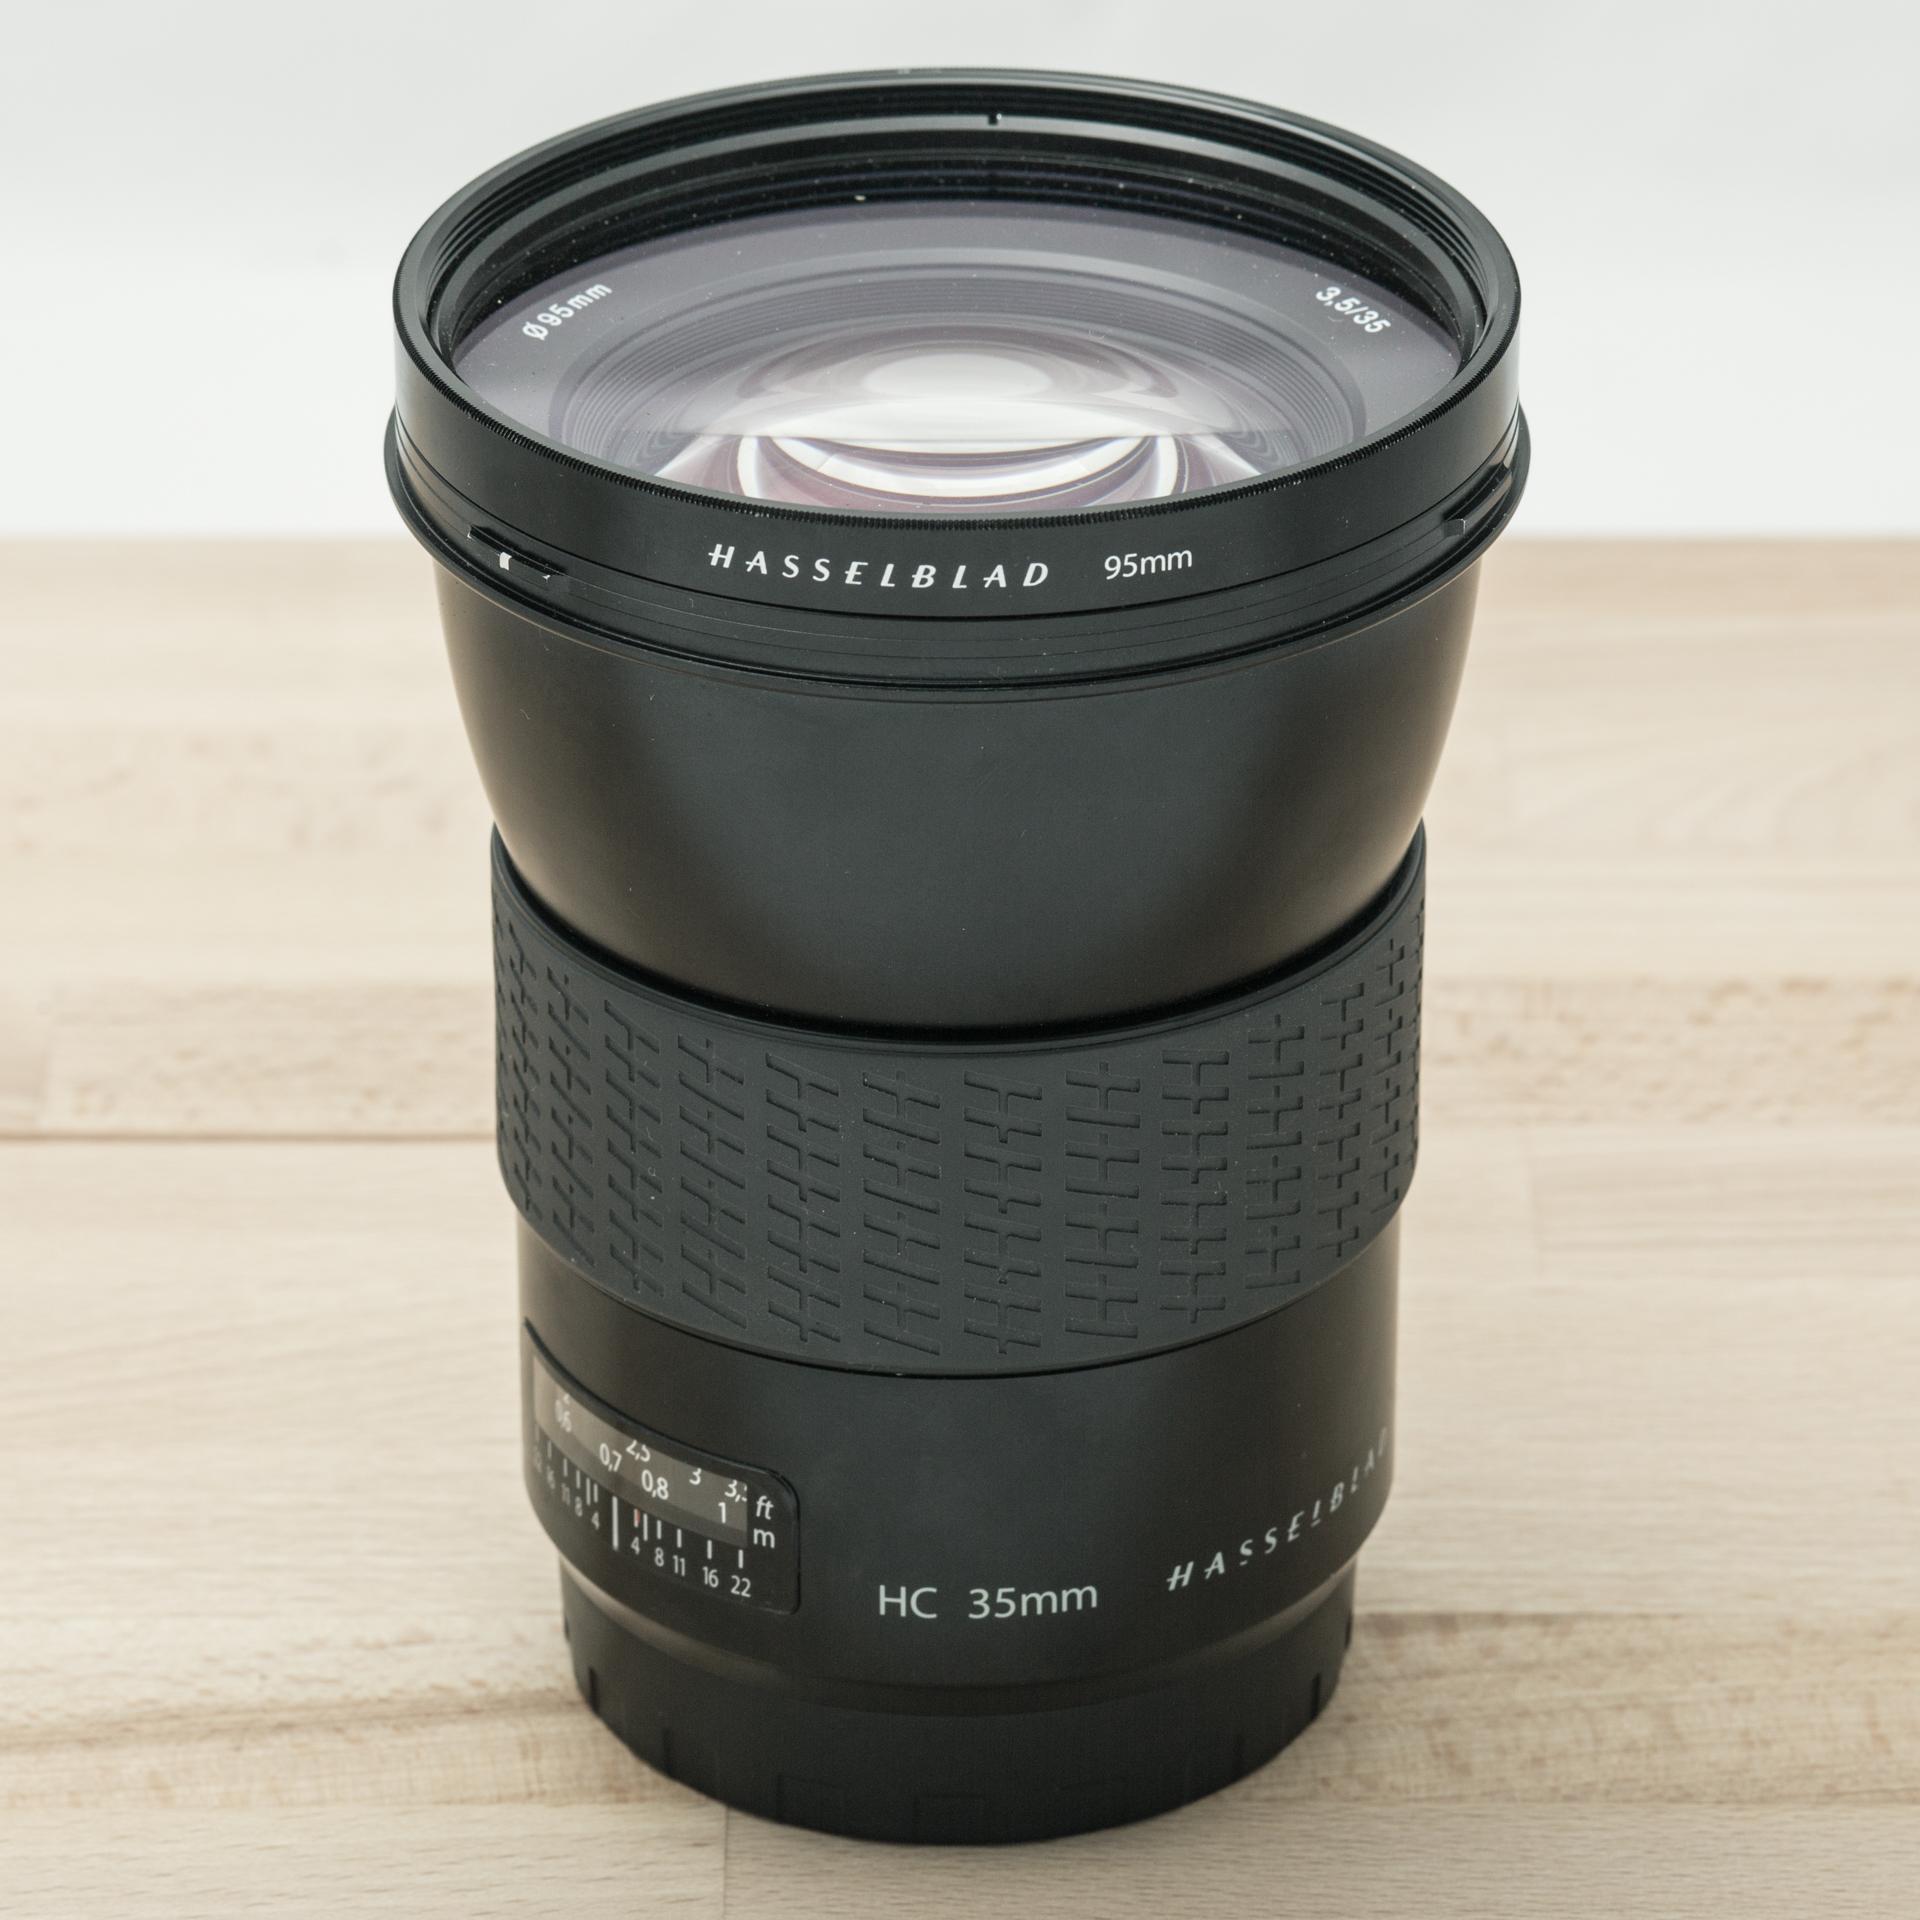 Hasselblad HC 35mm f/3.5 + Lens Shade + UV-Sky 95mm // 6.957 exposures